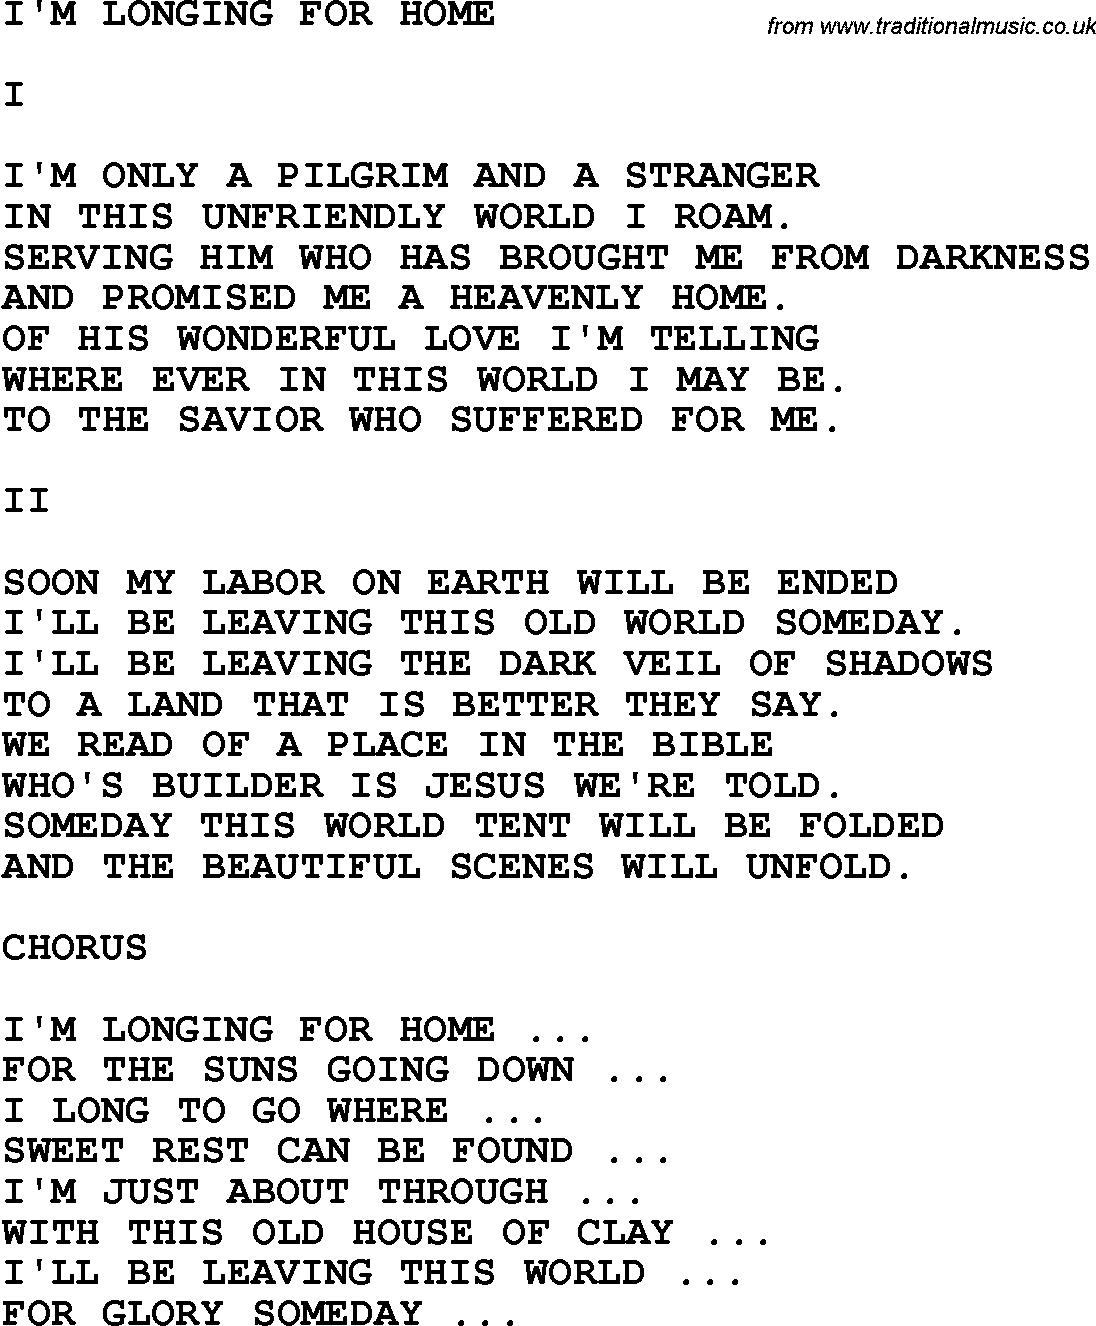 Gospel Song I'm Longing For Home Lyrics   Music Lyrics   Pinterest - Free Printable Gospel Music Lyrics